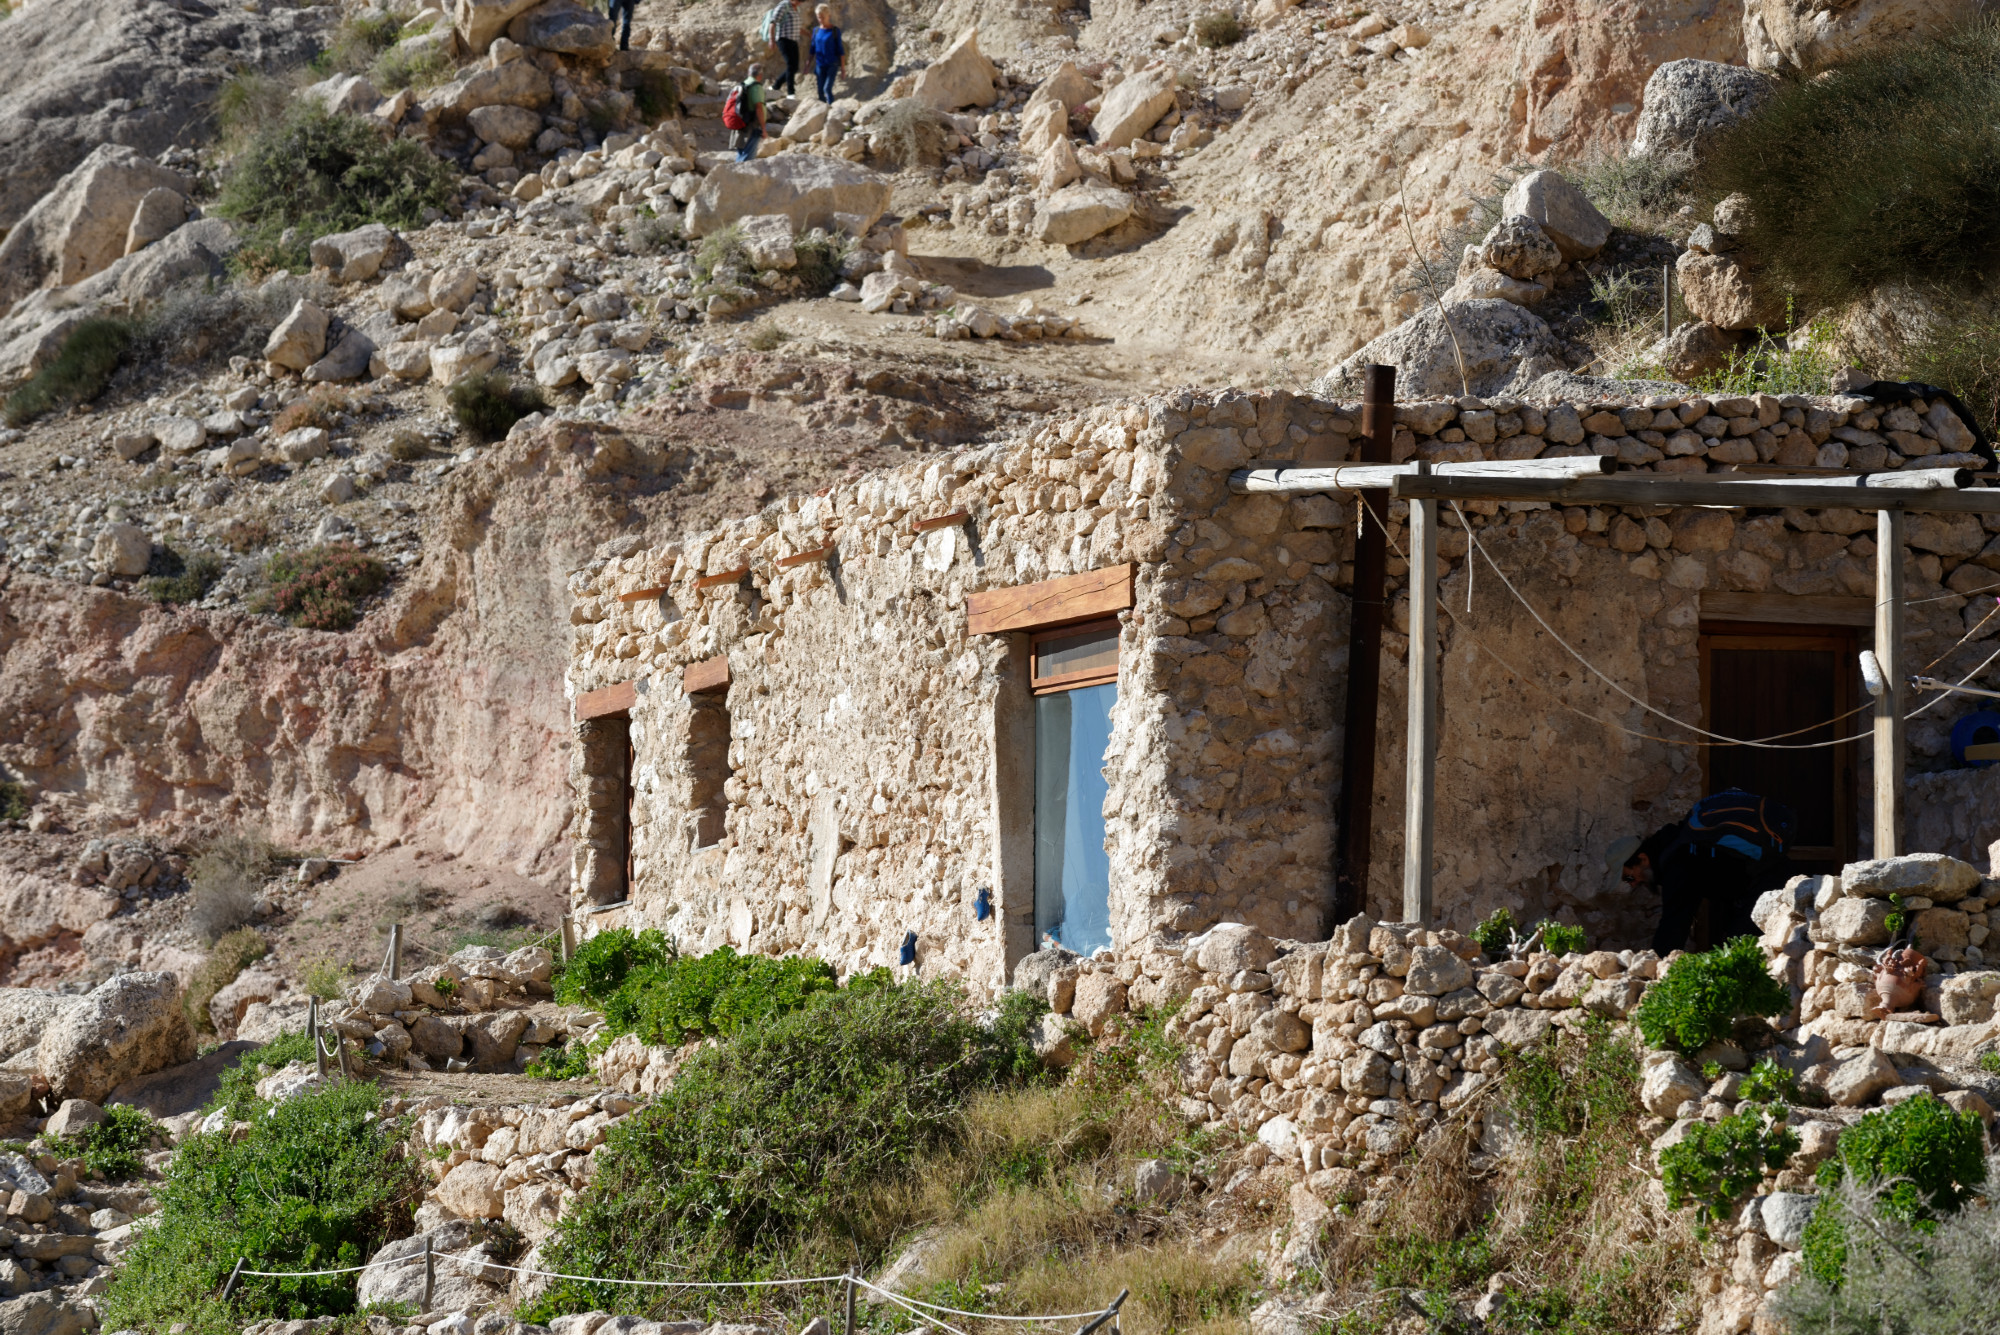 171213-Marche Las Negras-Cala San Pedro-Las Negras (50) (Cabo de Gata-Andalousie)